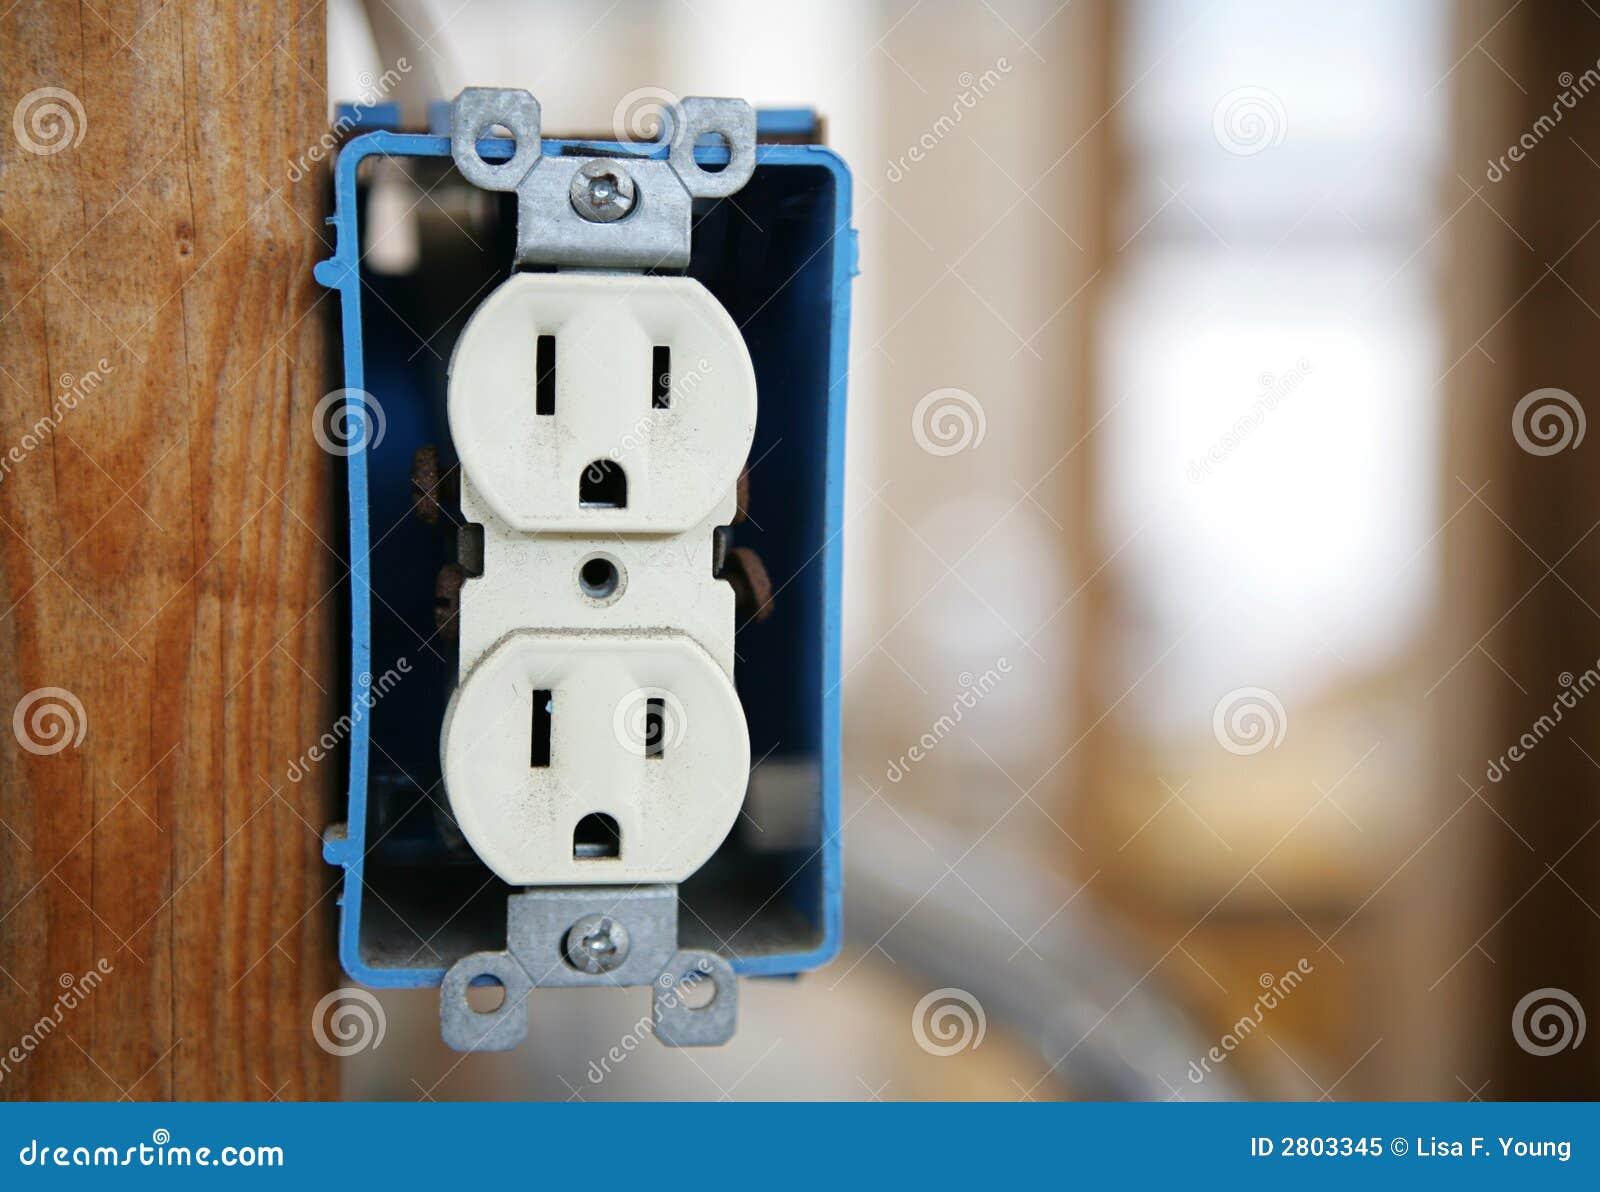 Que Es Gfci Outlet En Espaol The Curtain Galleries Circuit Breaker 1pole 1in 15a Walmartcom Electrical Receptacle Stock Image Of Copyspace 2803345